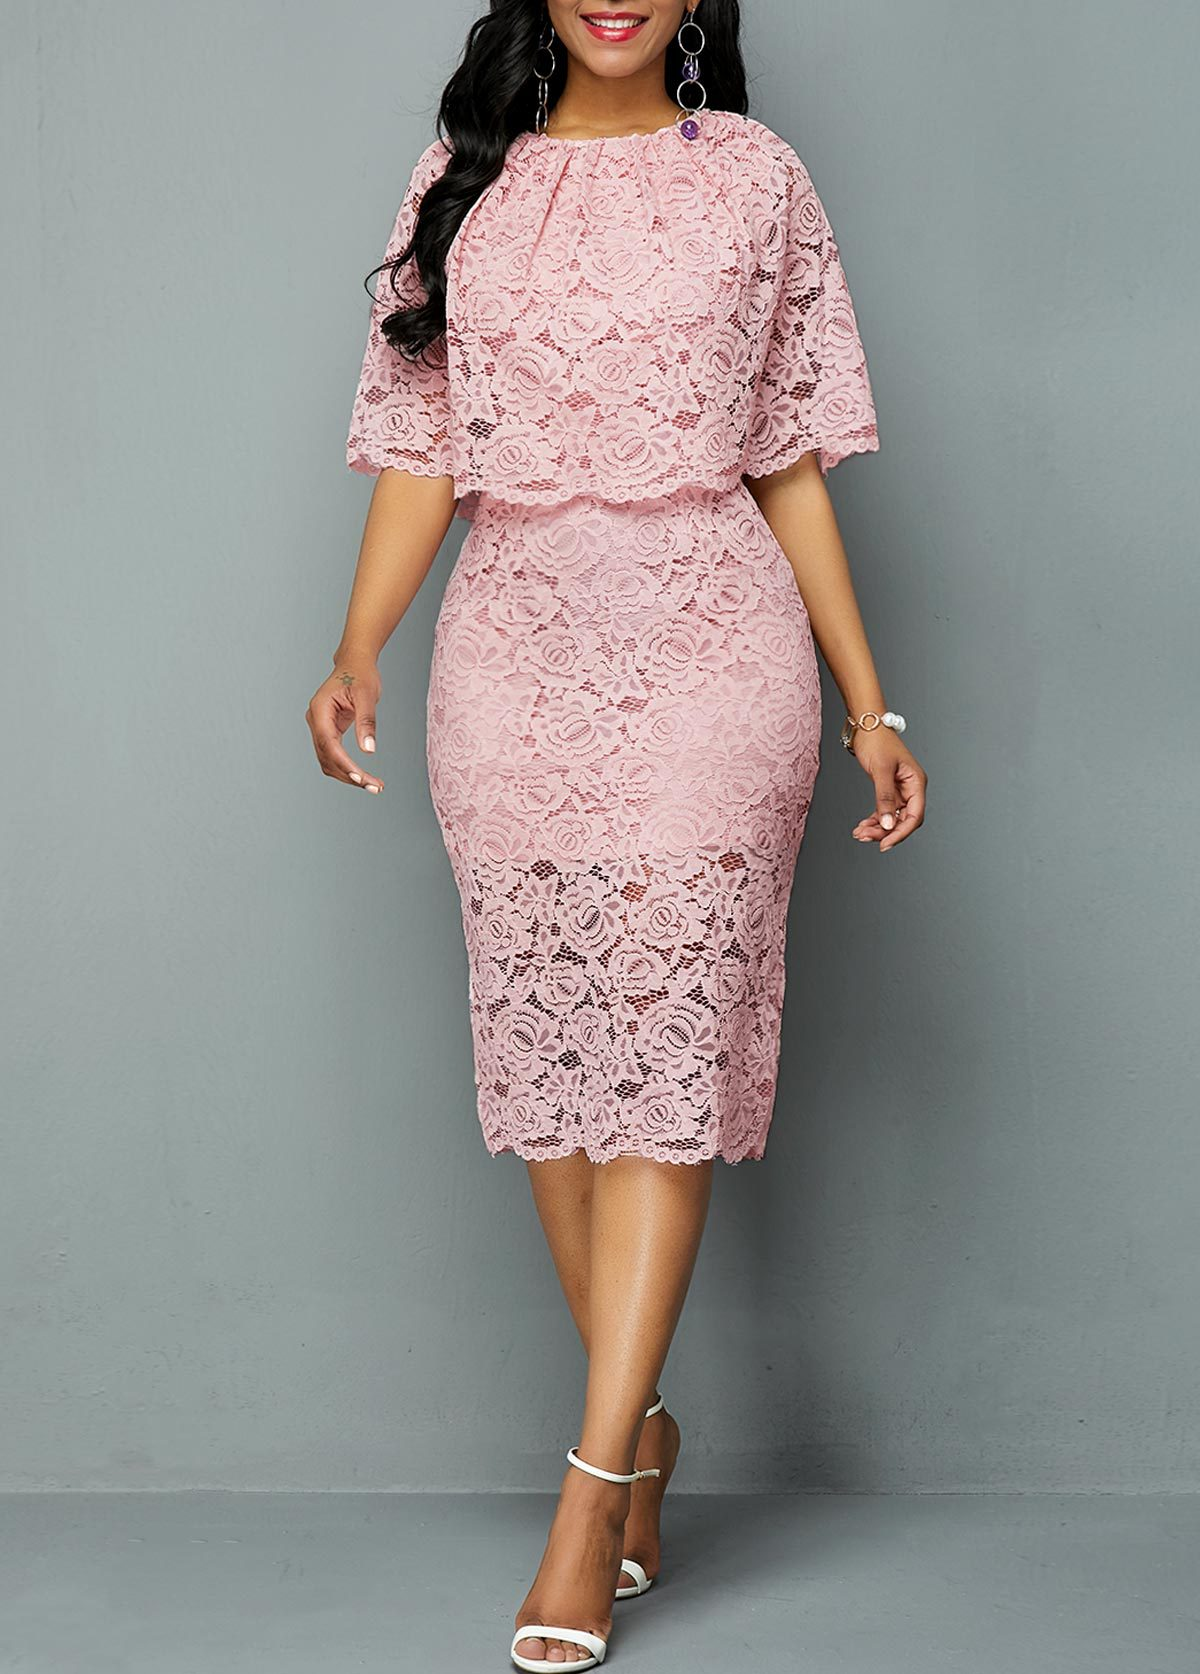 Large Size Dress Round Neck Lace Cutout Dress Female Elegant Five-point Sleeves Slim Party Large Size Dress Female Vestidos 5xl 1